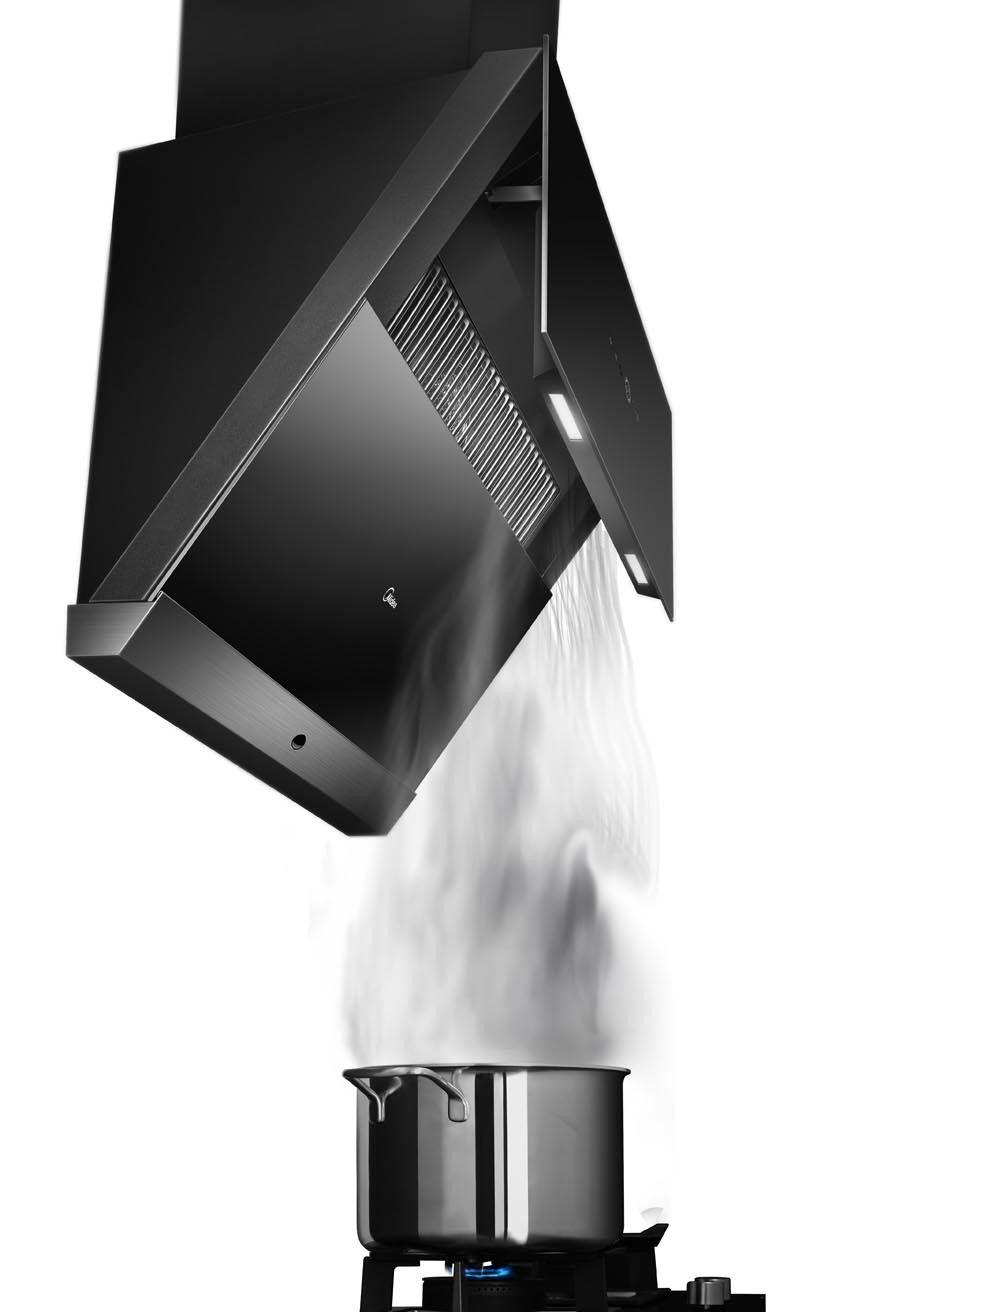 E评测:美的蒸汽洗油烟机天幕系列探秘